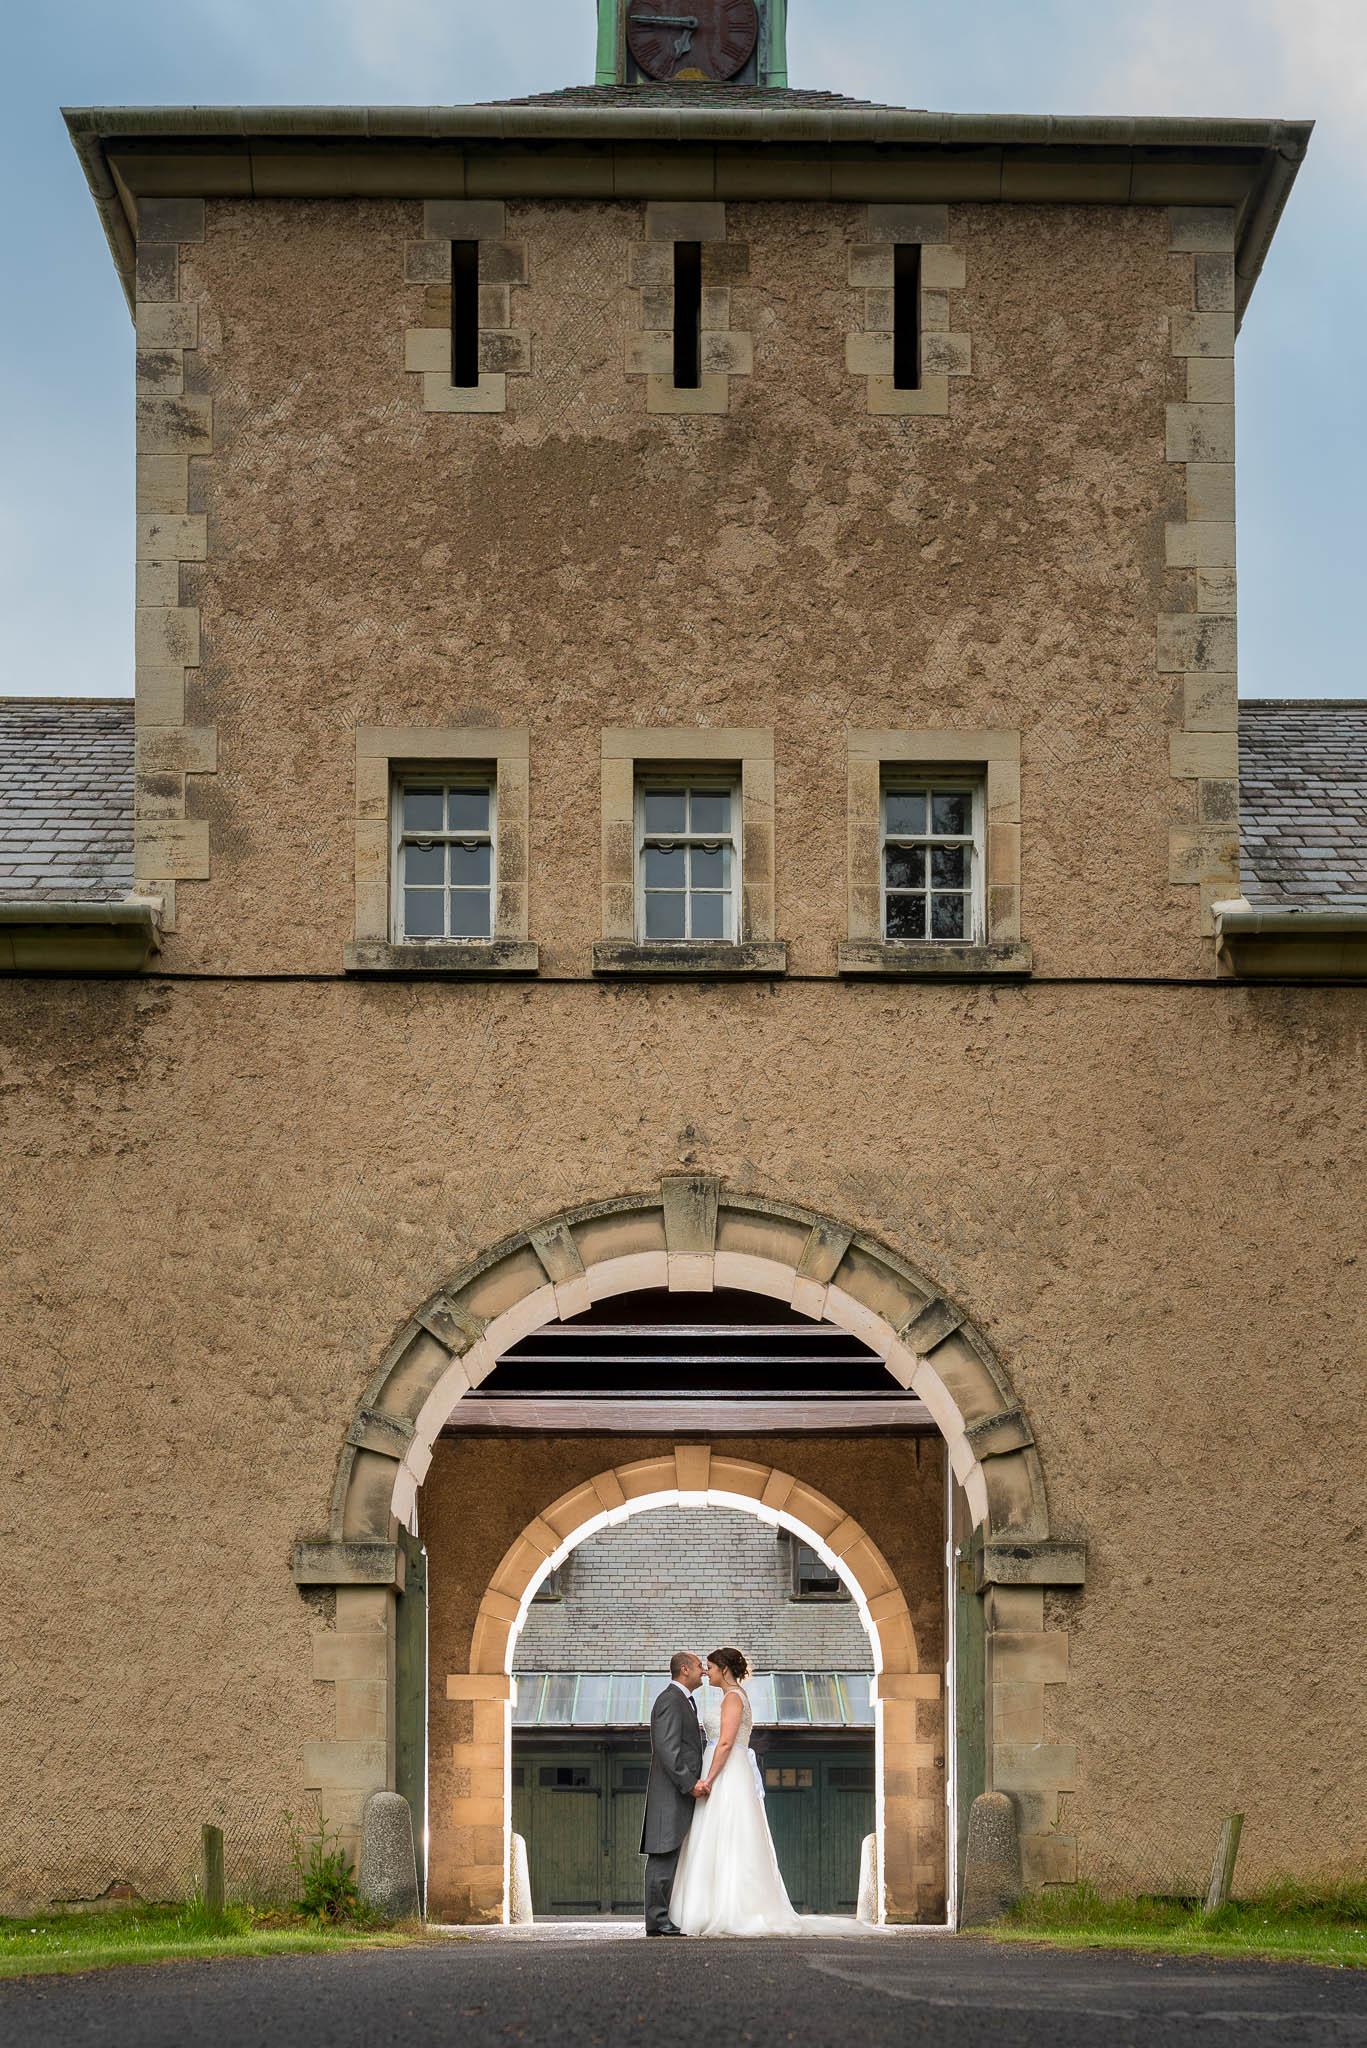 Dan & Alison - Crathorne Hall Hotel Wedding